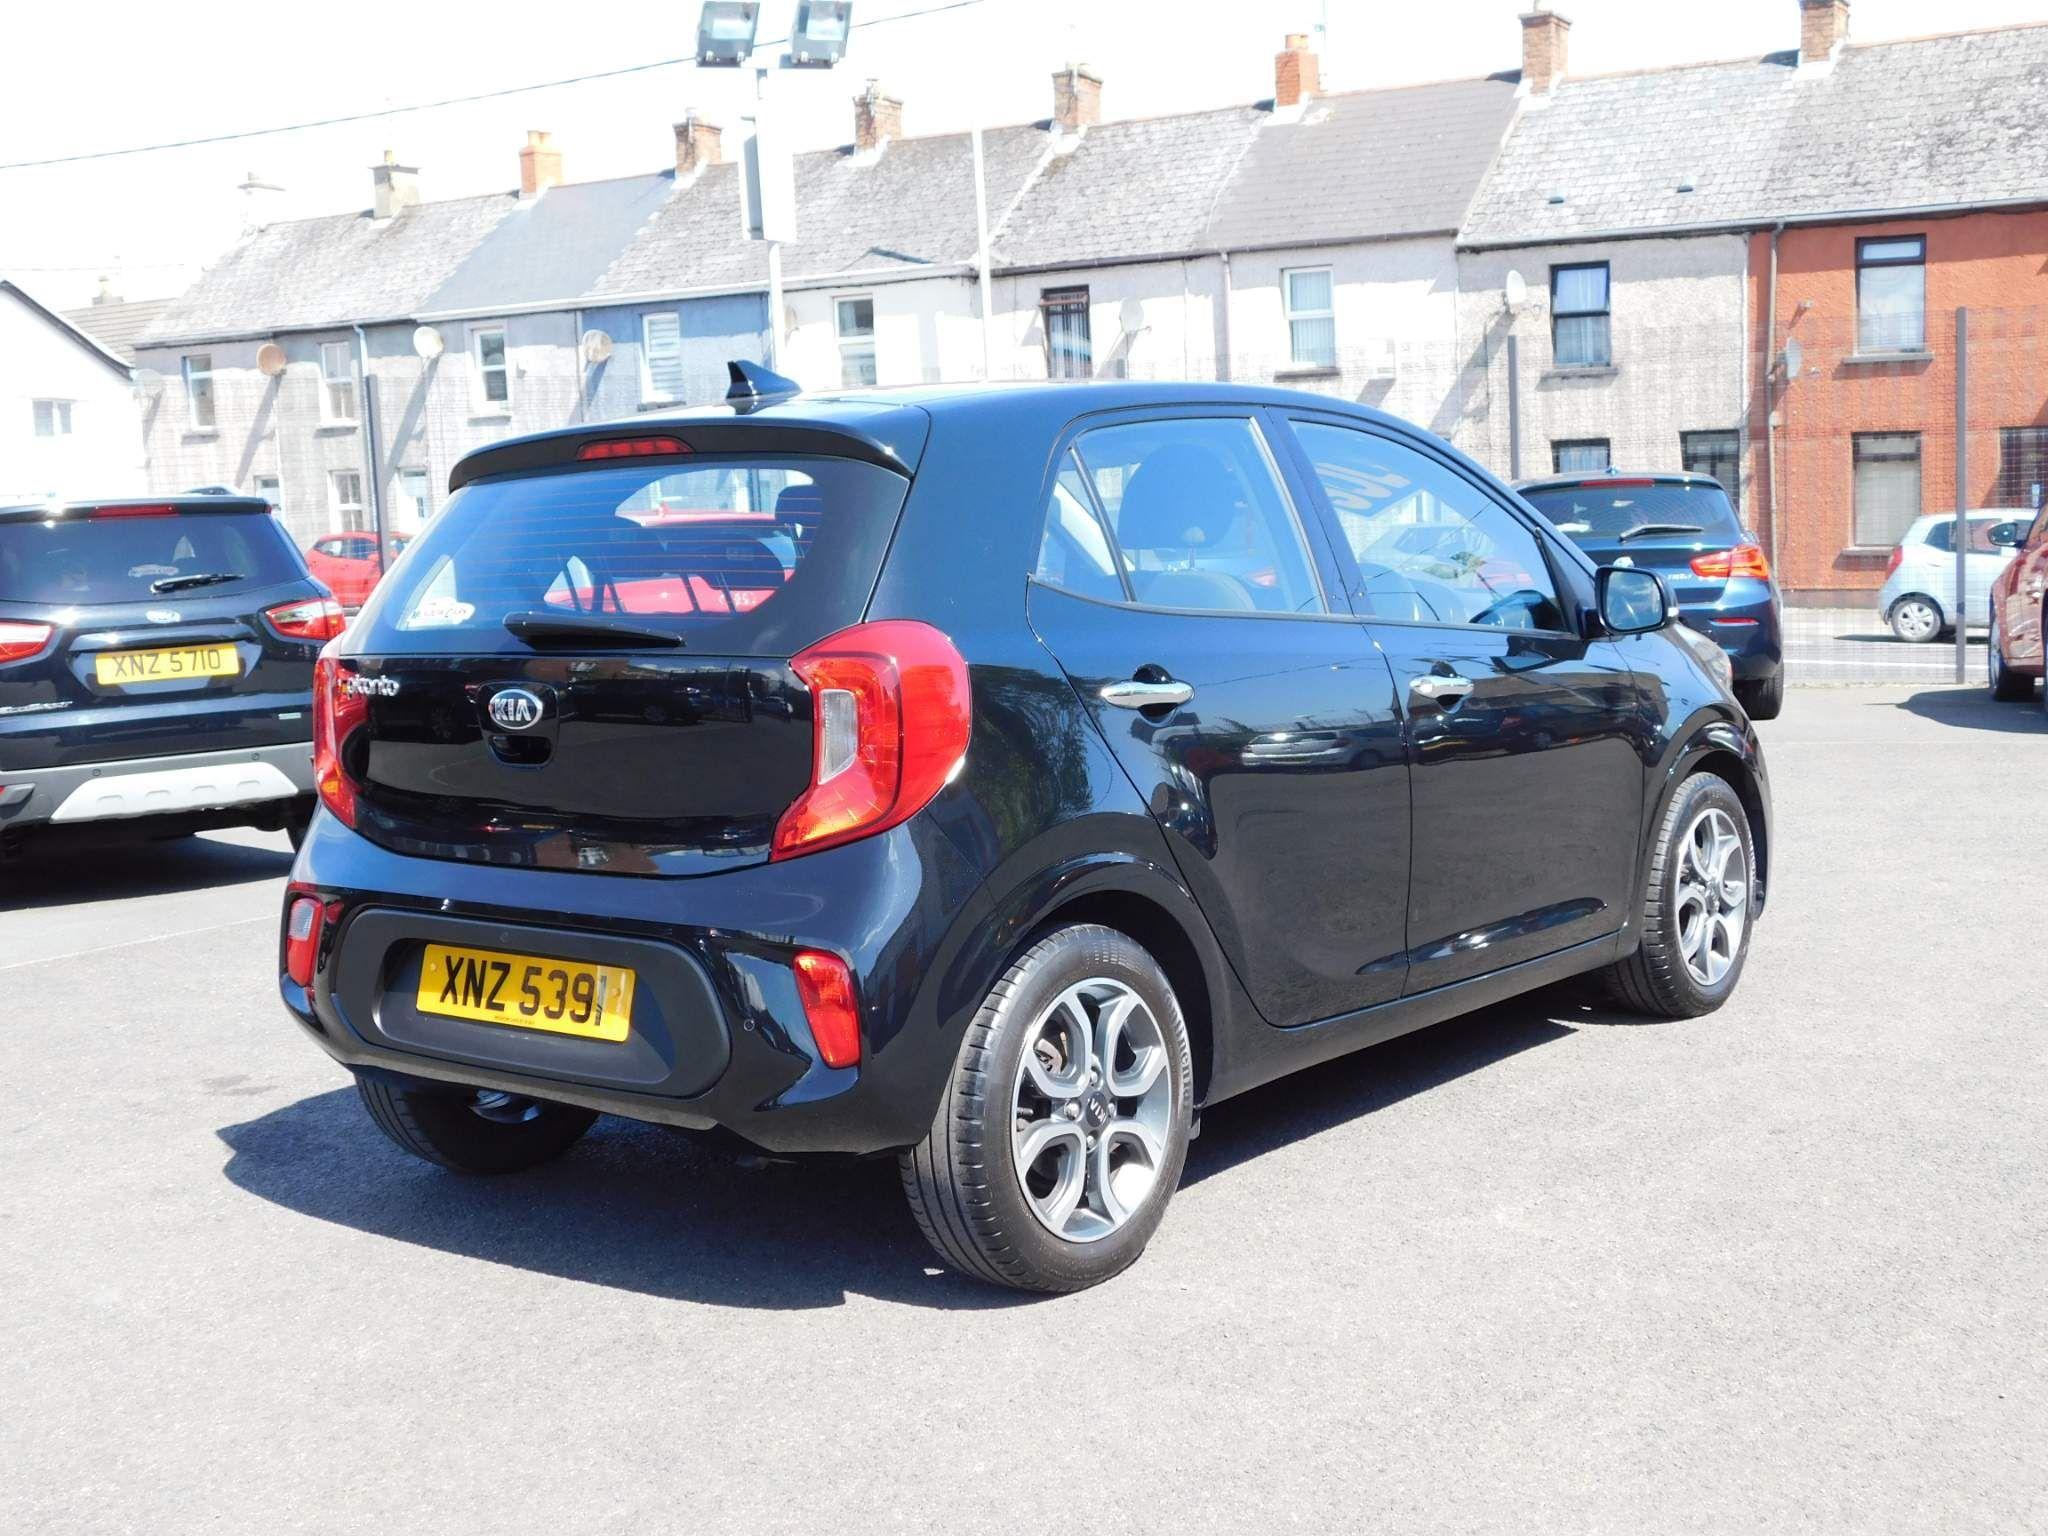 2018 KIA Picanto 1.25 3 Petrol Manual due in – Meadow Cars Carrickfergus full